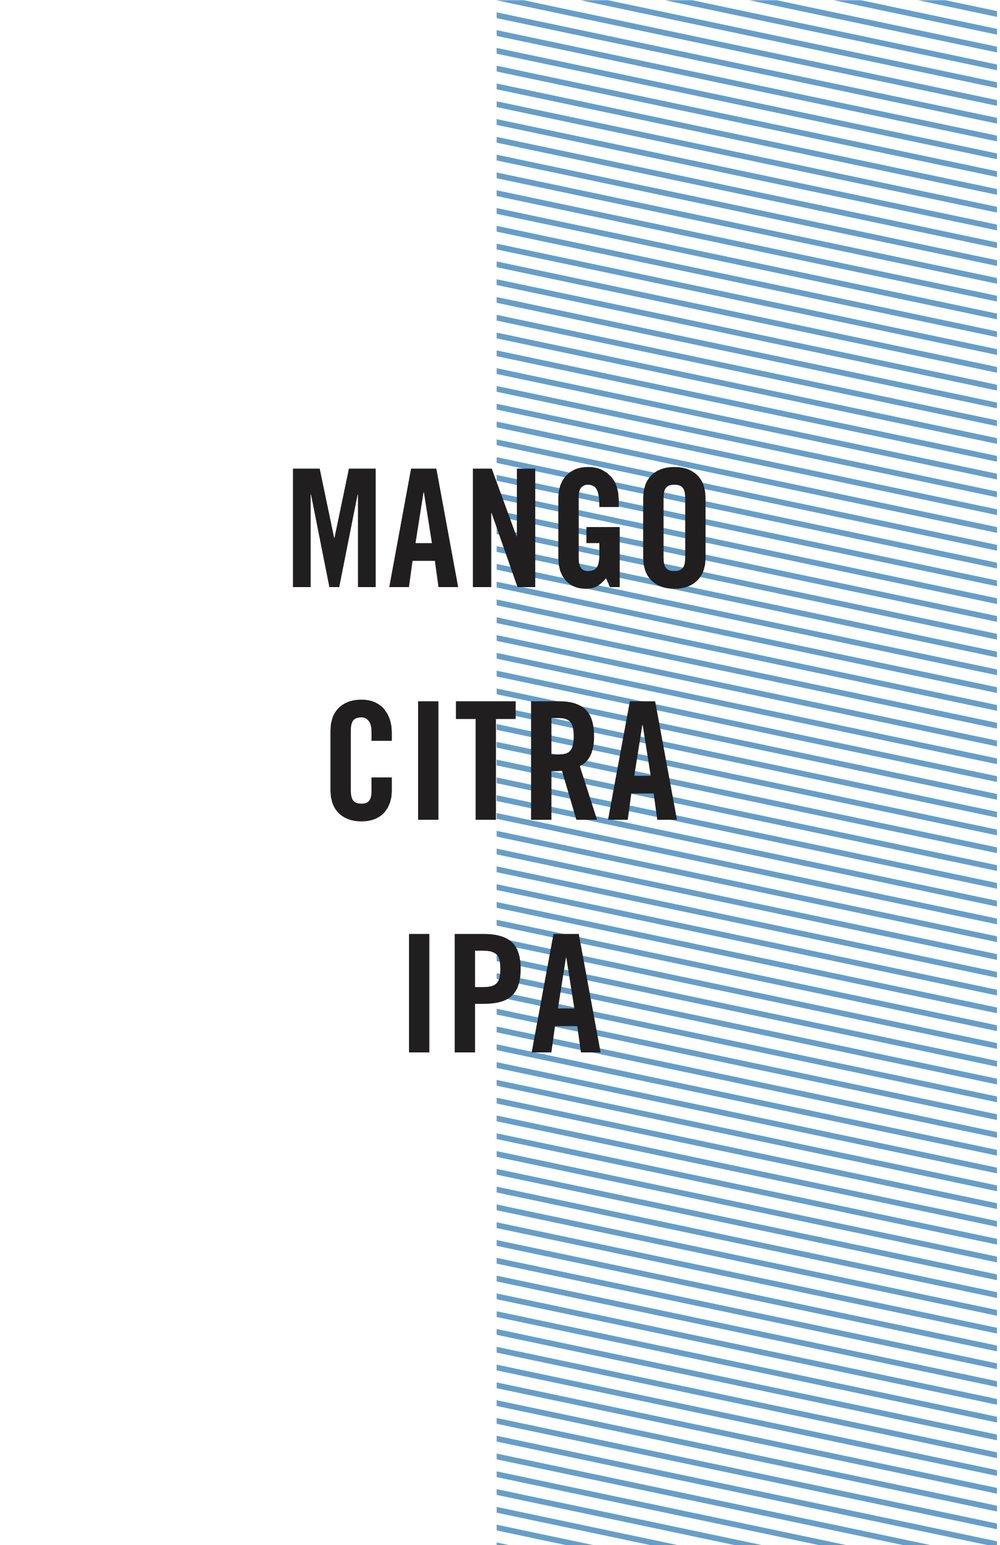 MANGO CITRA IPA.jpg